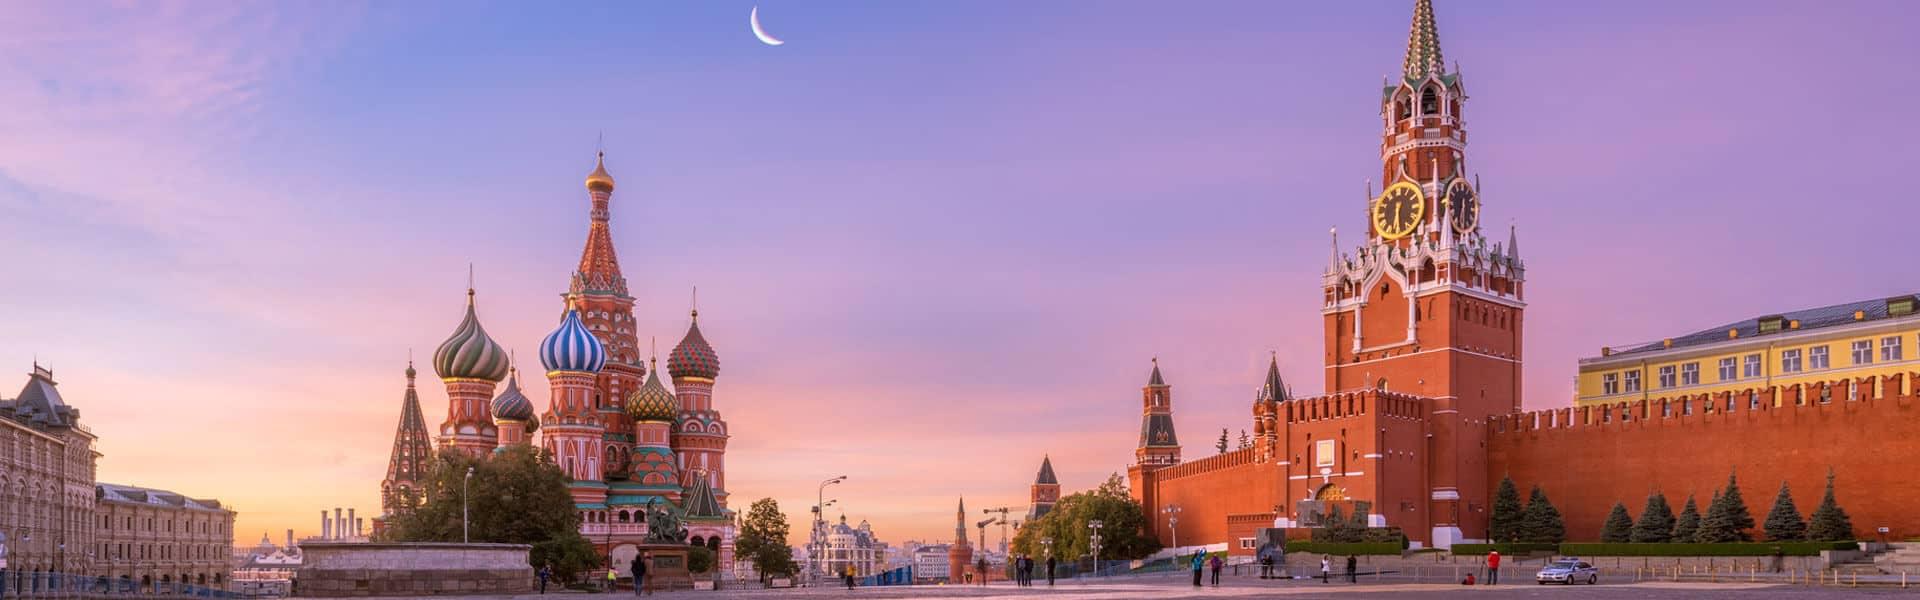 Visum Russland-Moskau-Roter Platz-Kremel